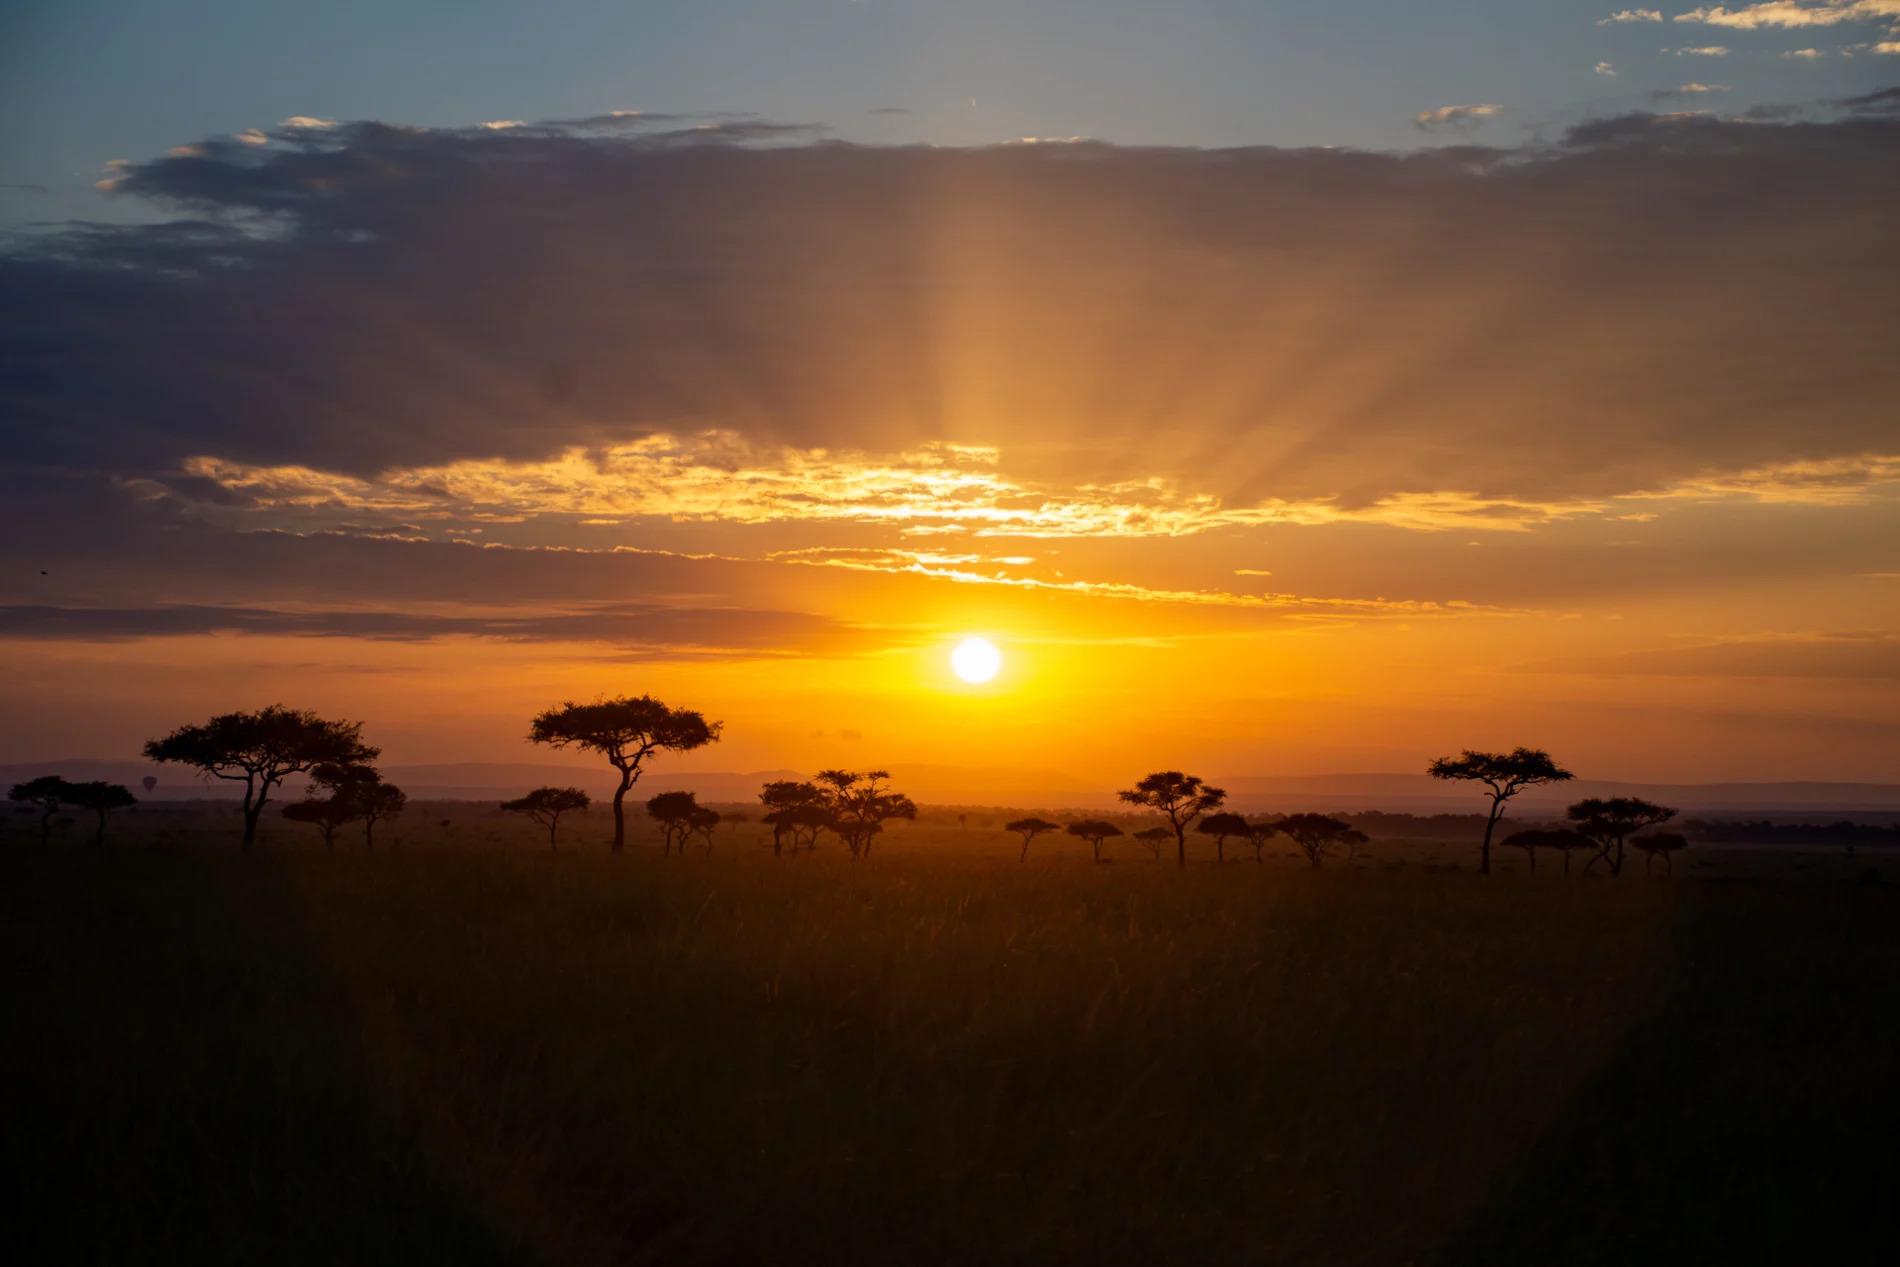 Balanites sunrise